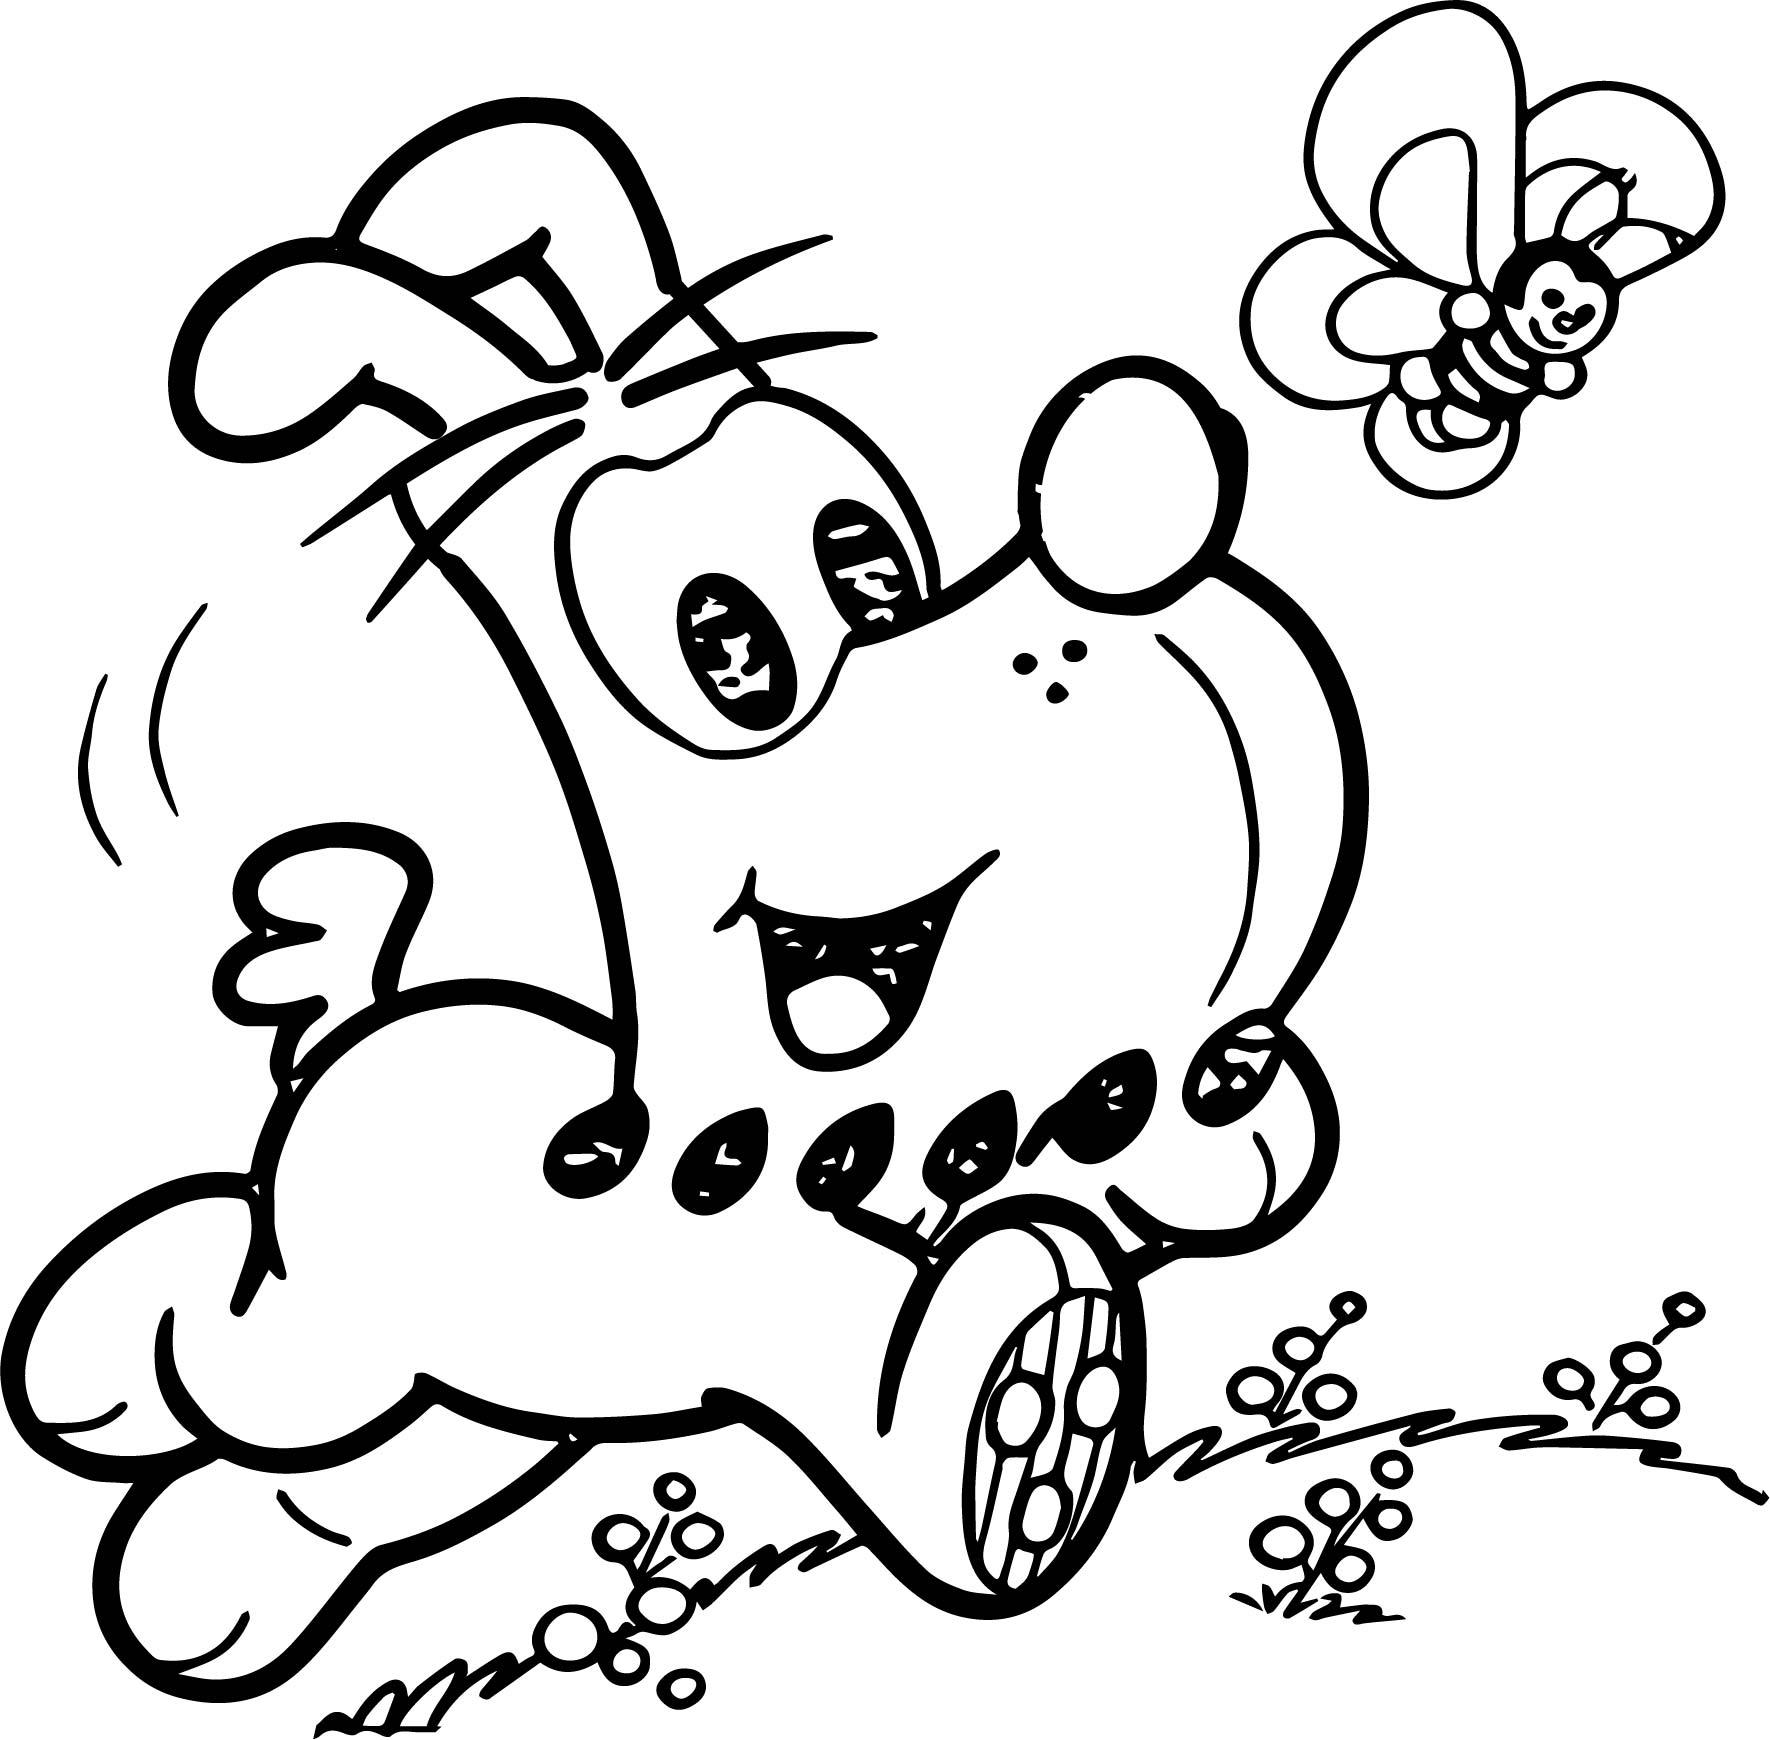 Bidu Dog Running And Bee Coloring Page